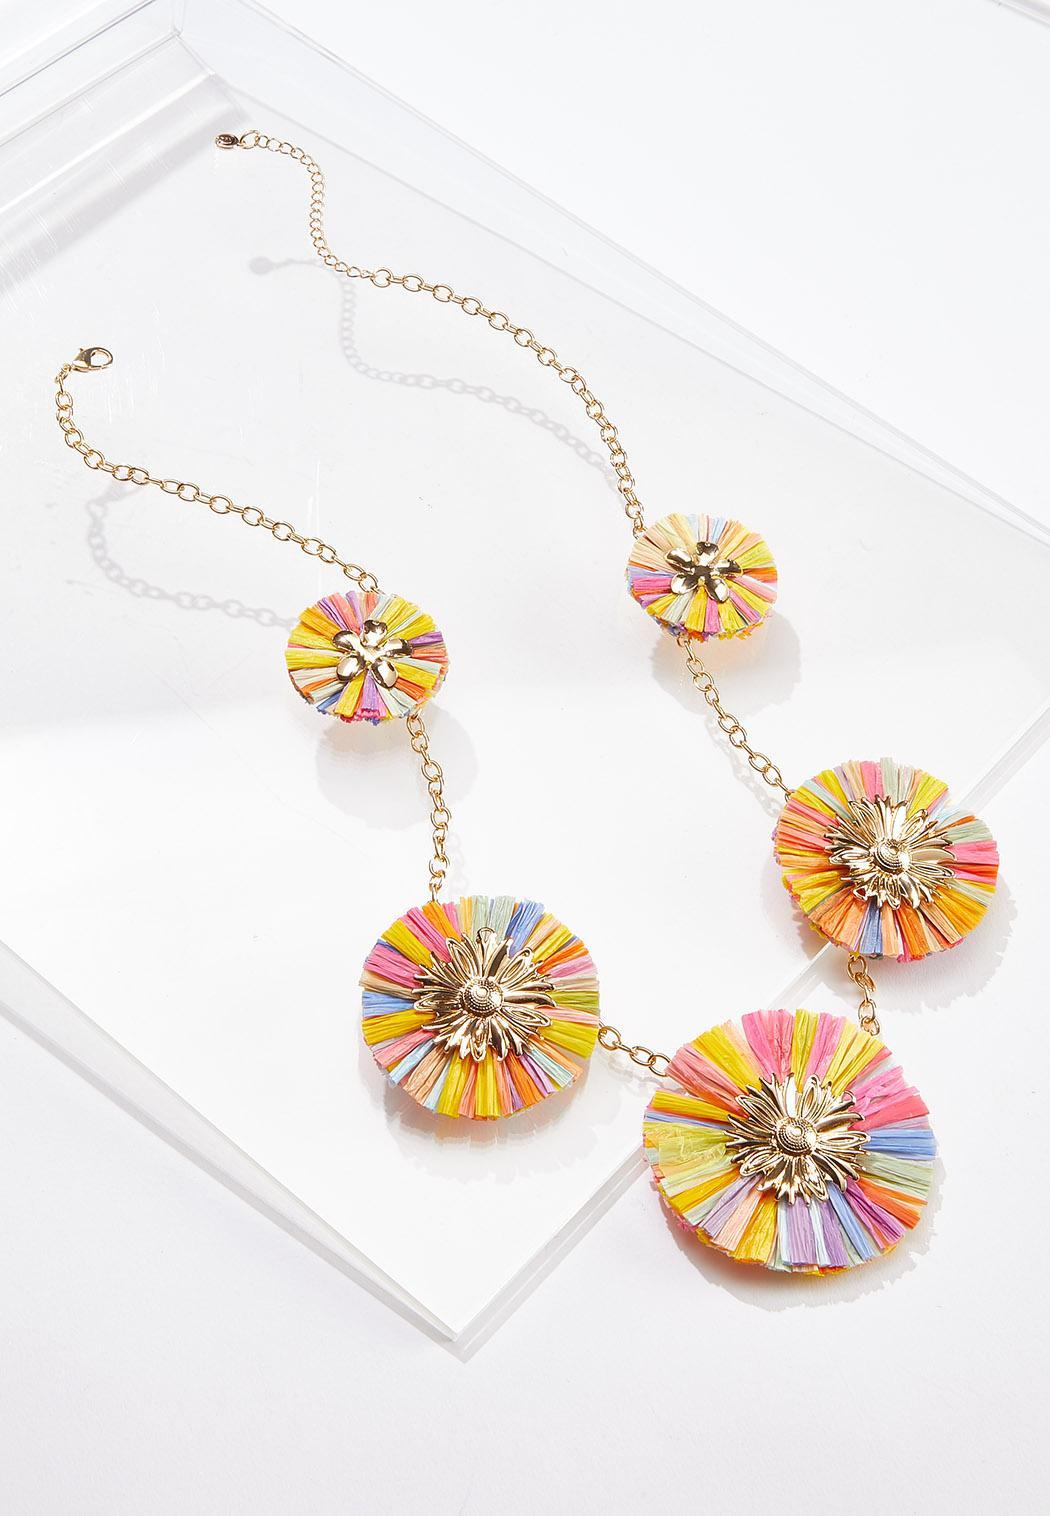 Rainbow Raffia Fan Necklace